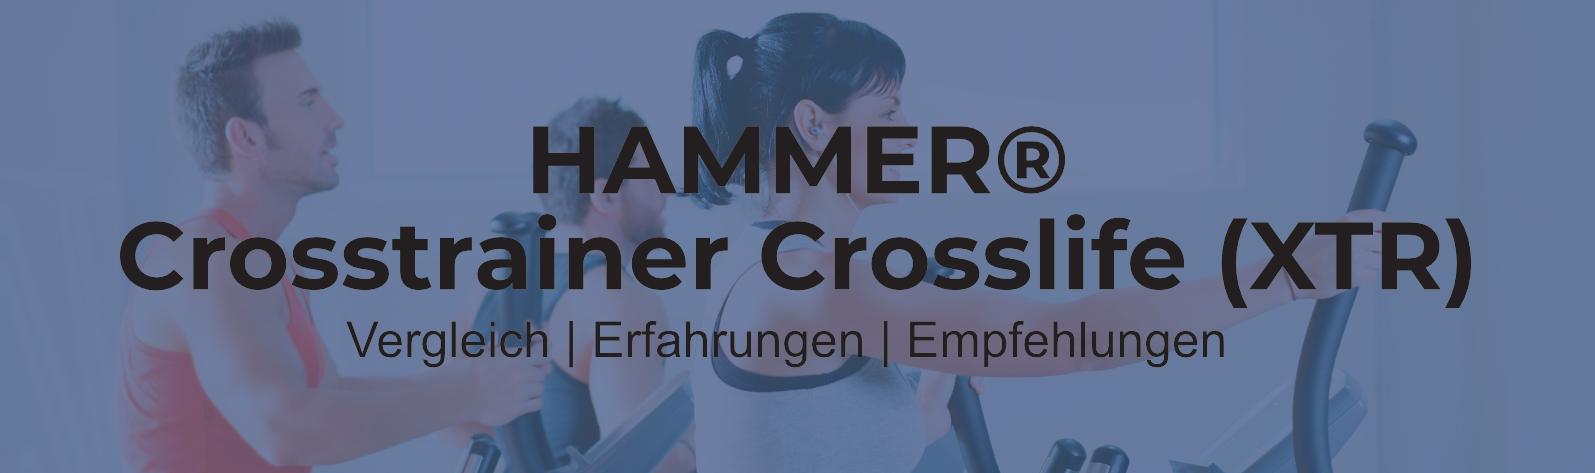 Hammer Crosslife XTR® Crosstrainer & Vergleich der Hammer-Crosstrainer